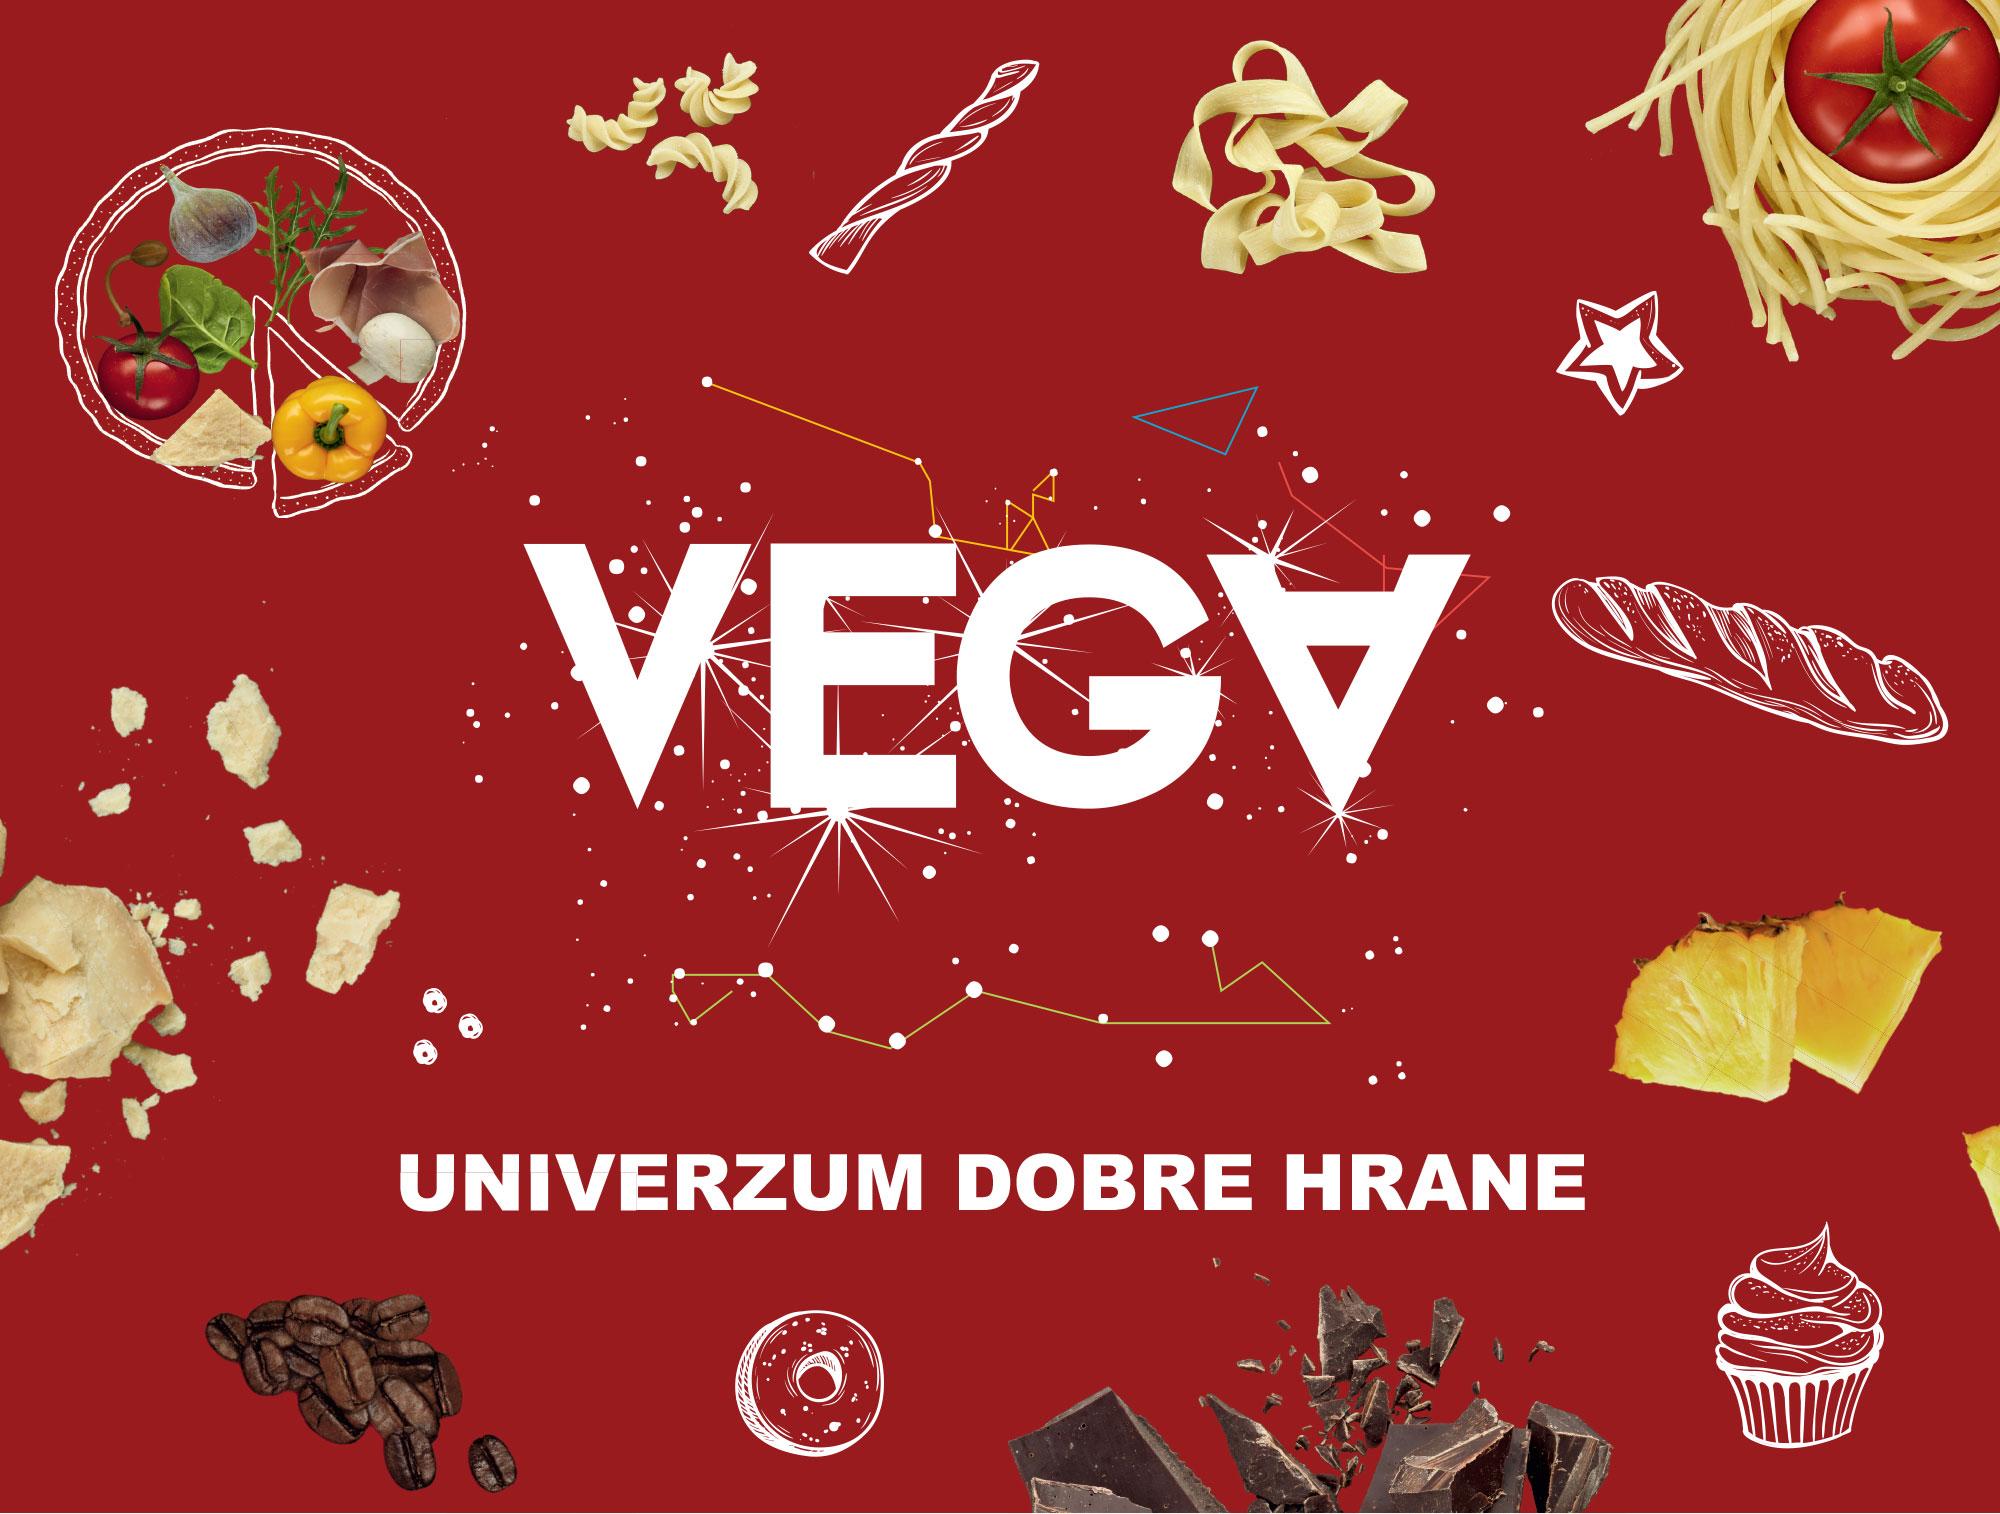 vega poster 1